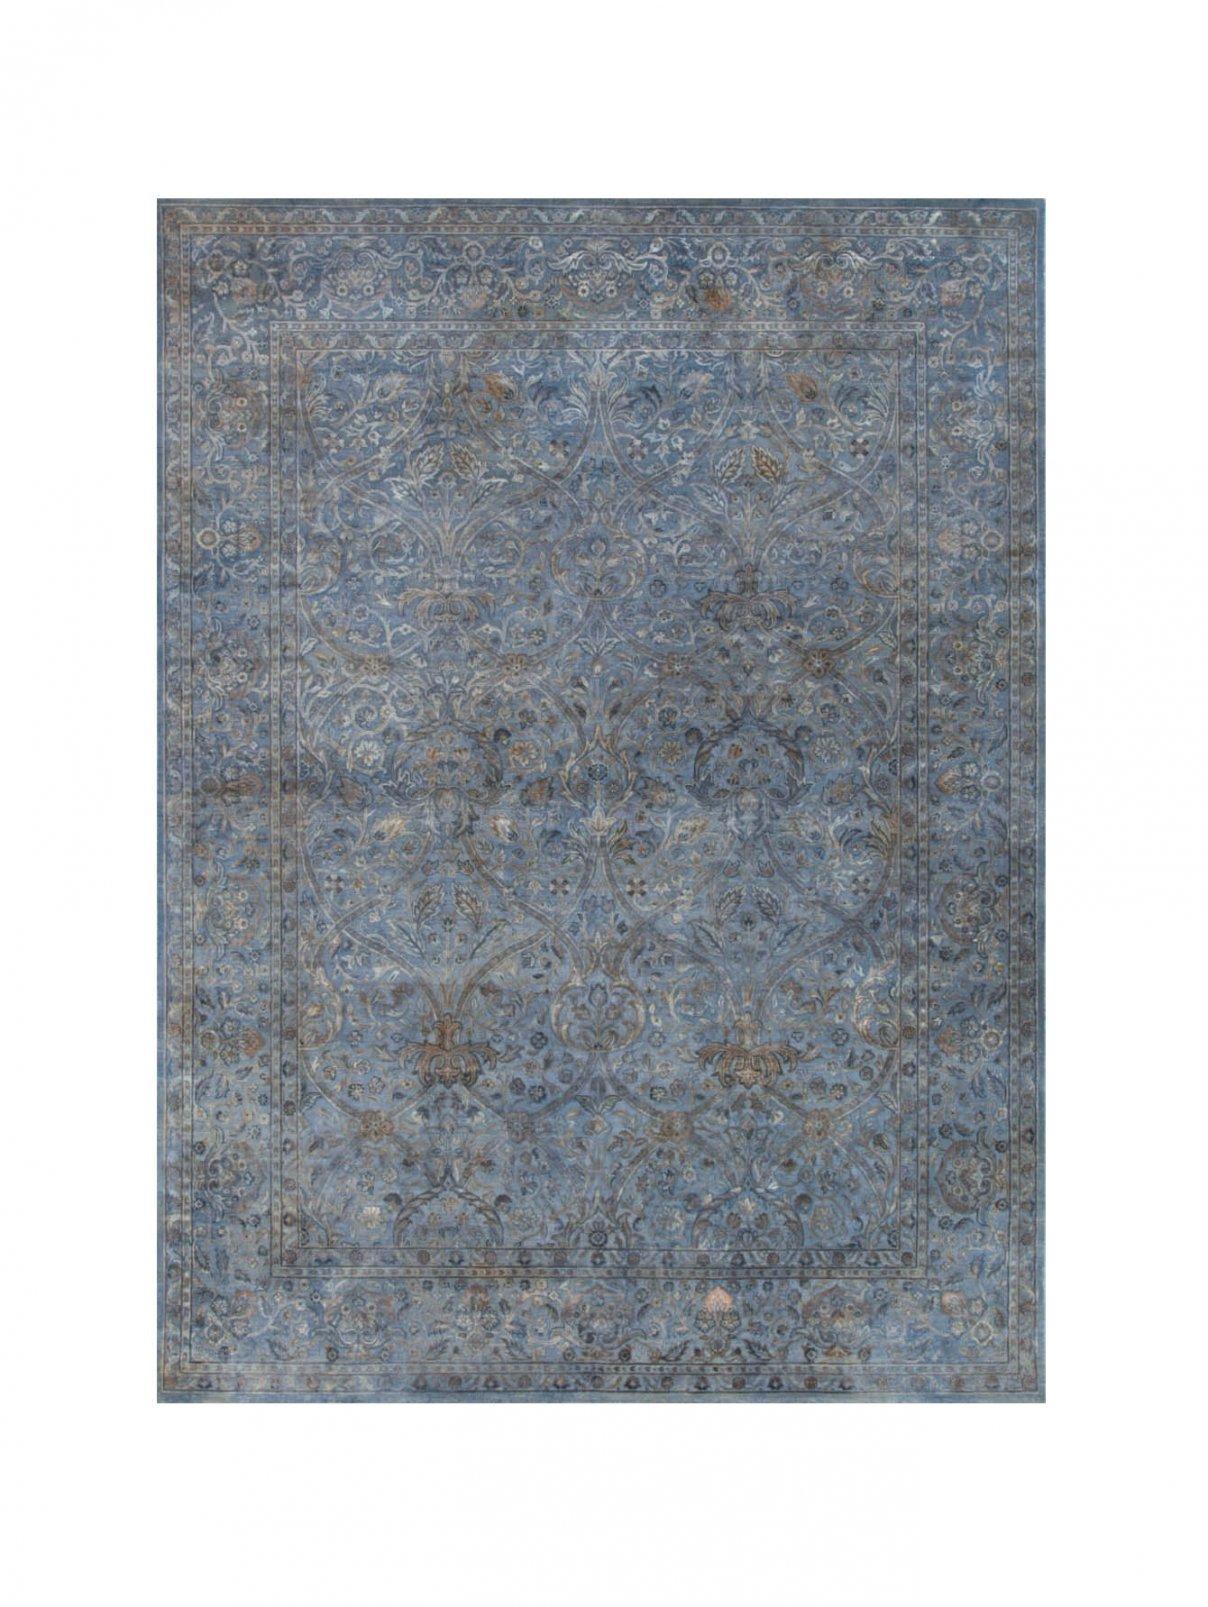 Ковер 300х200см BROCCATO I BLUE AFFRESCO Amini Carpets  –  Общий вид